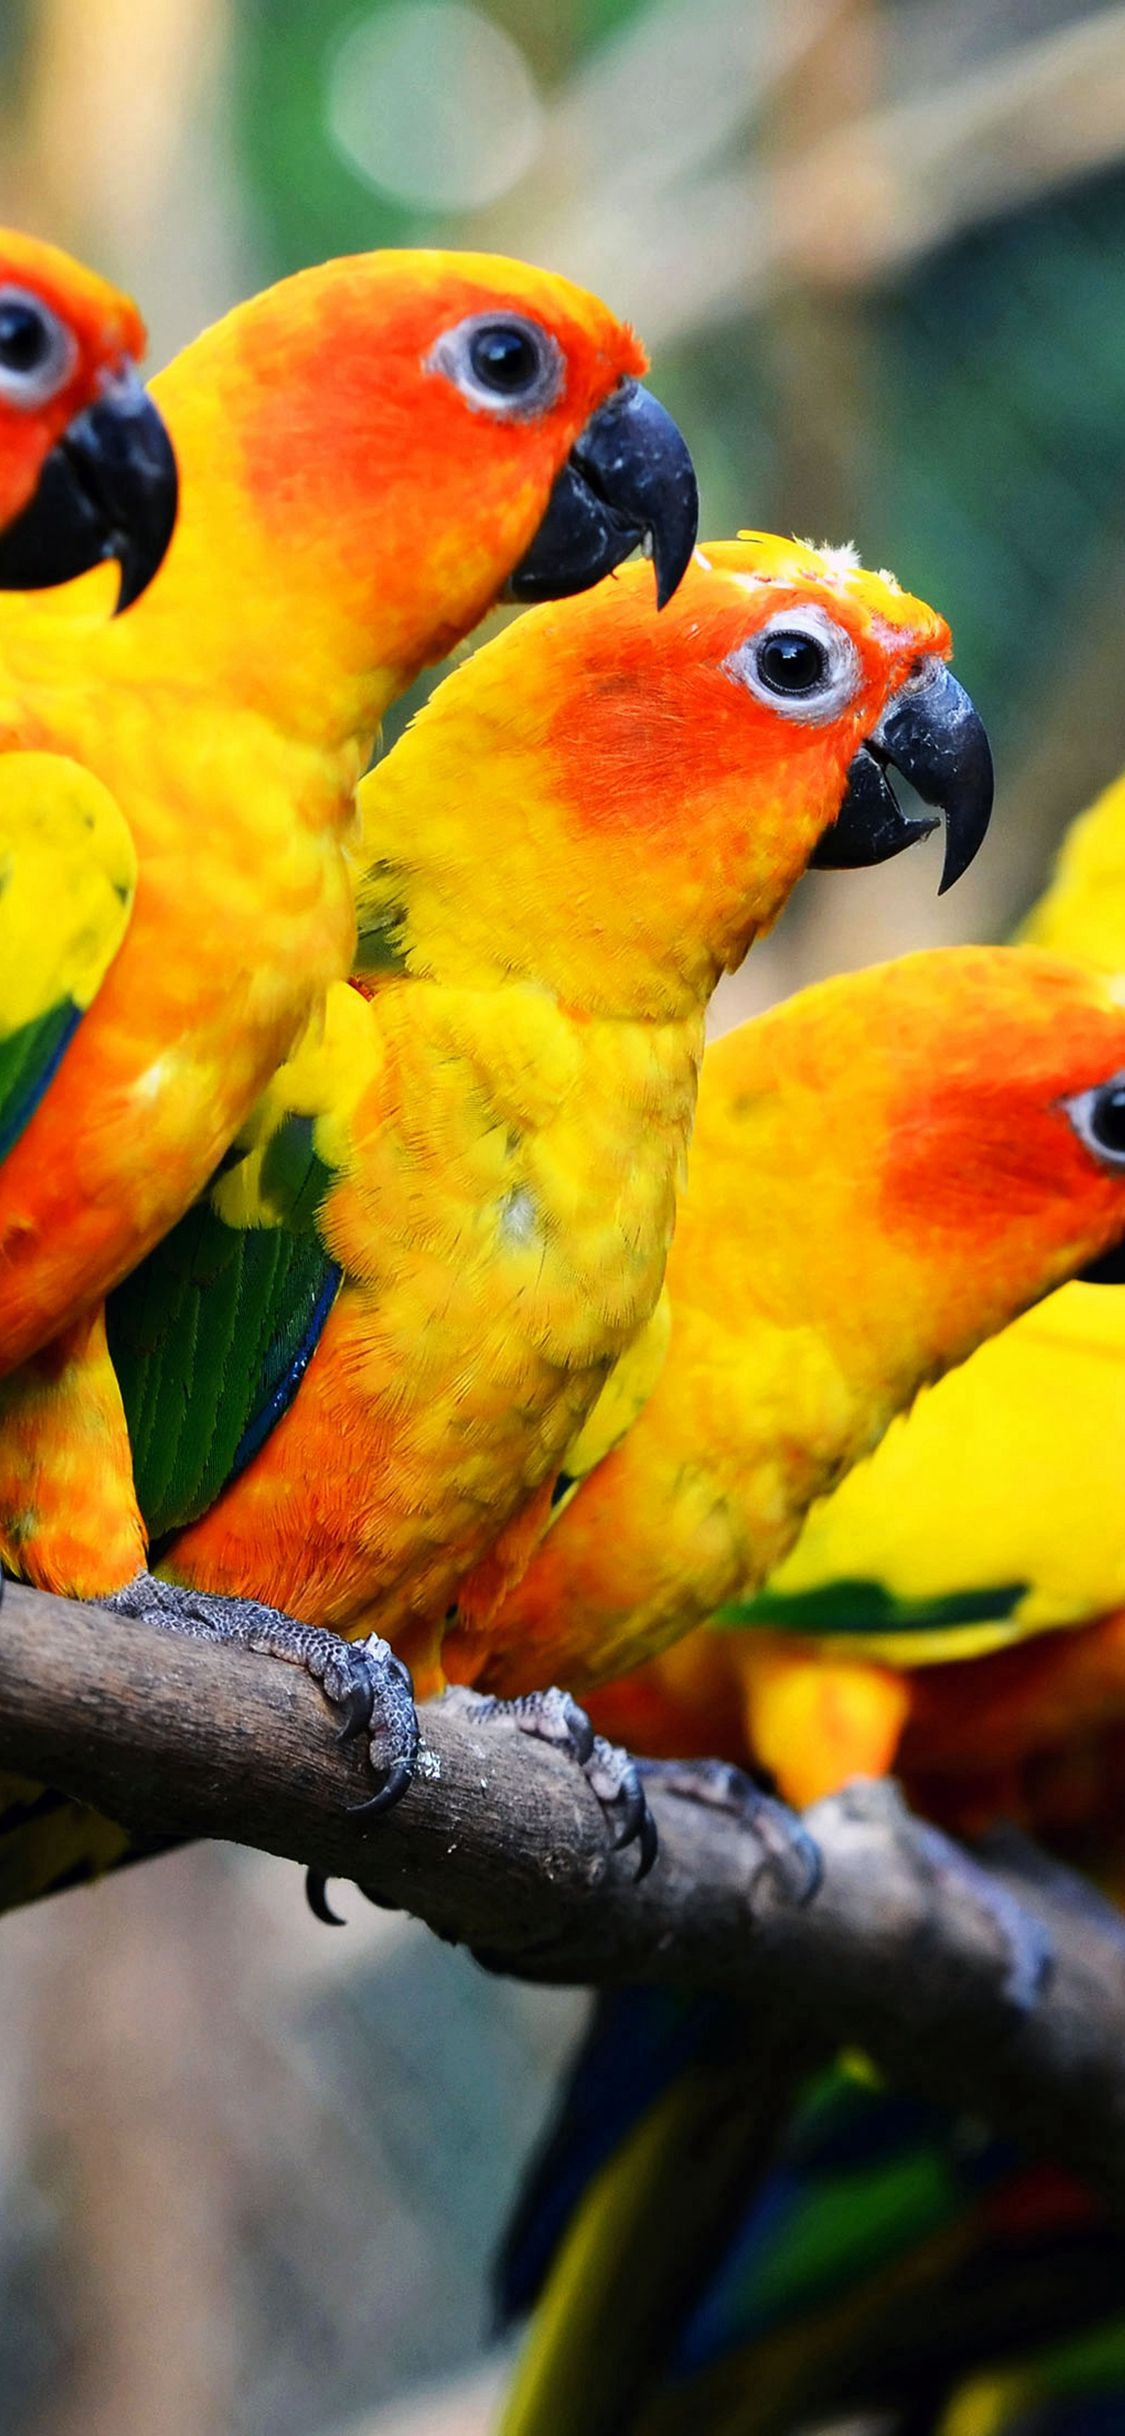 Mocking Bird Family Nature Art iPhone X Wallpapers